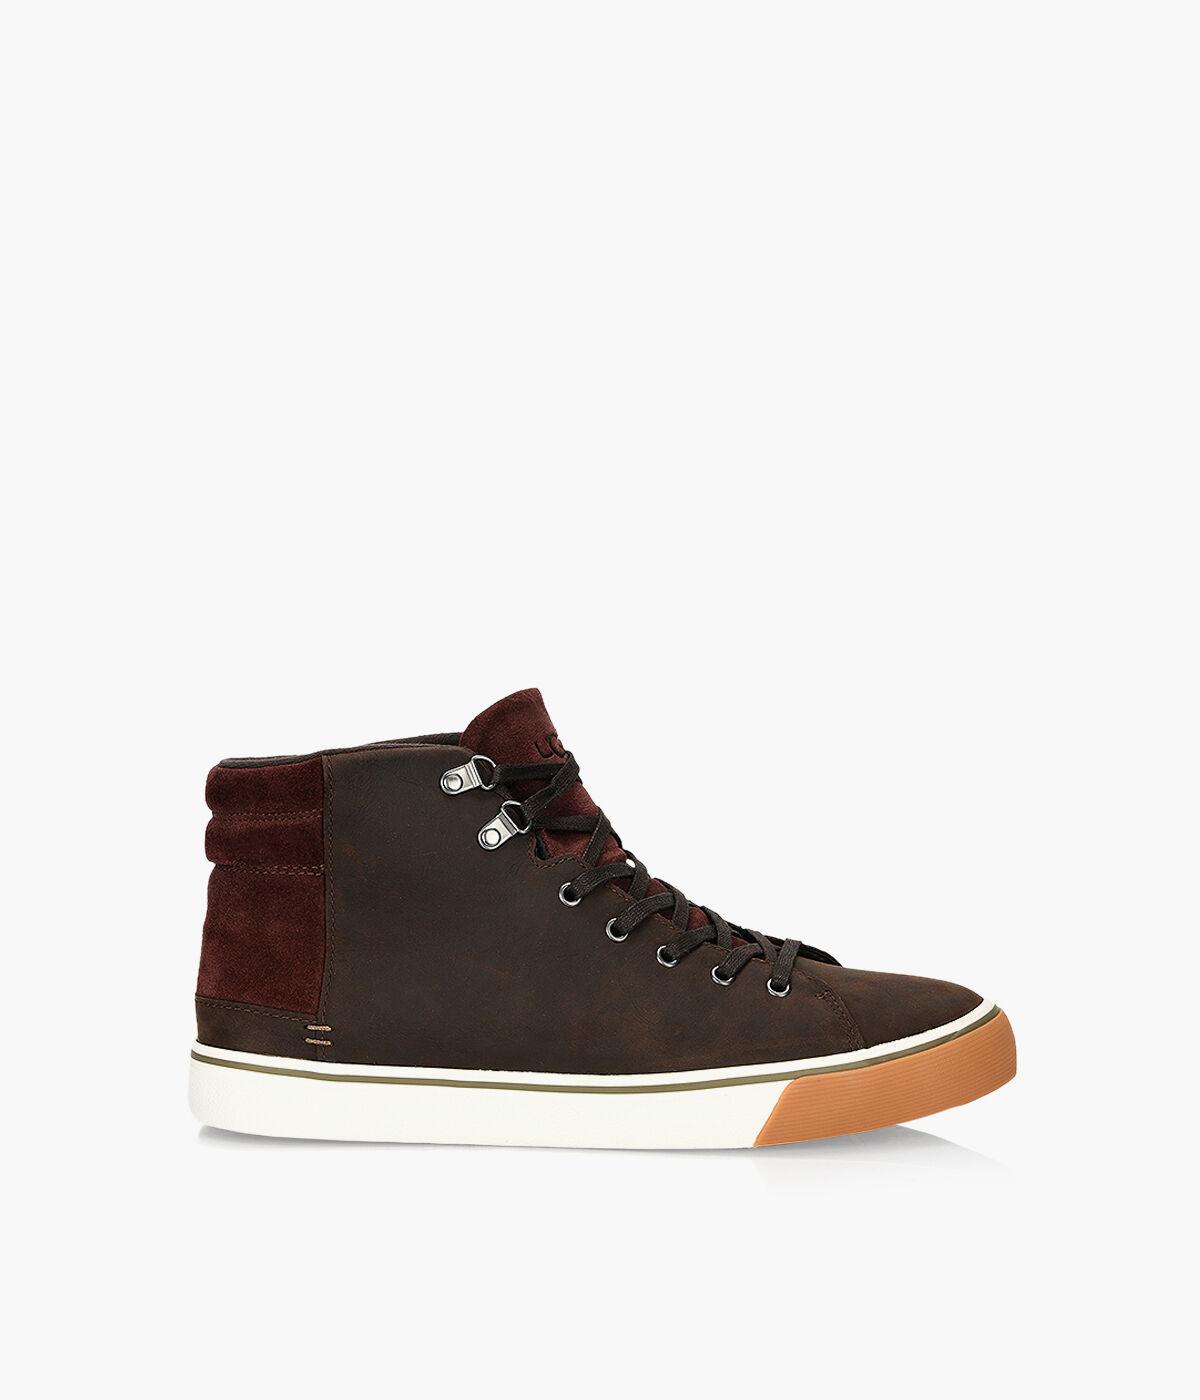 UGG HOYT II WP - Brown Leather   Browns